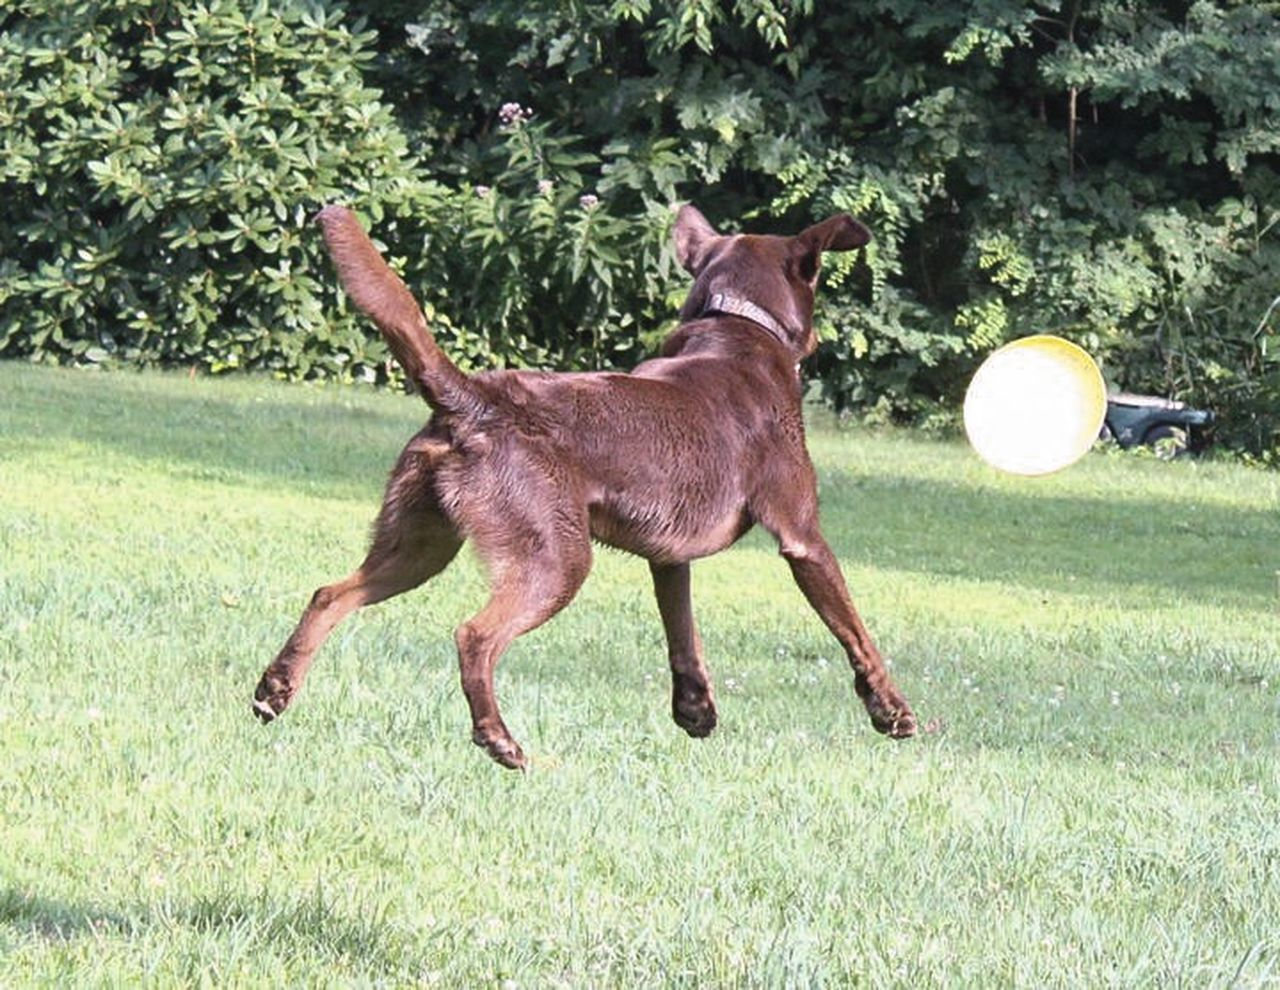 Summer Dogs Chocolate Labrador Retriever Frisbee Playingcatch